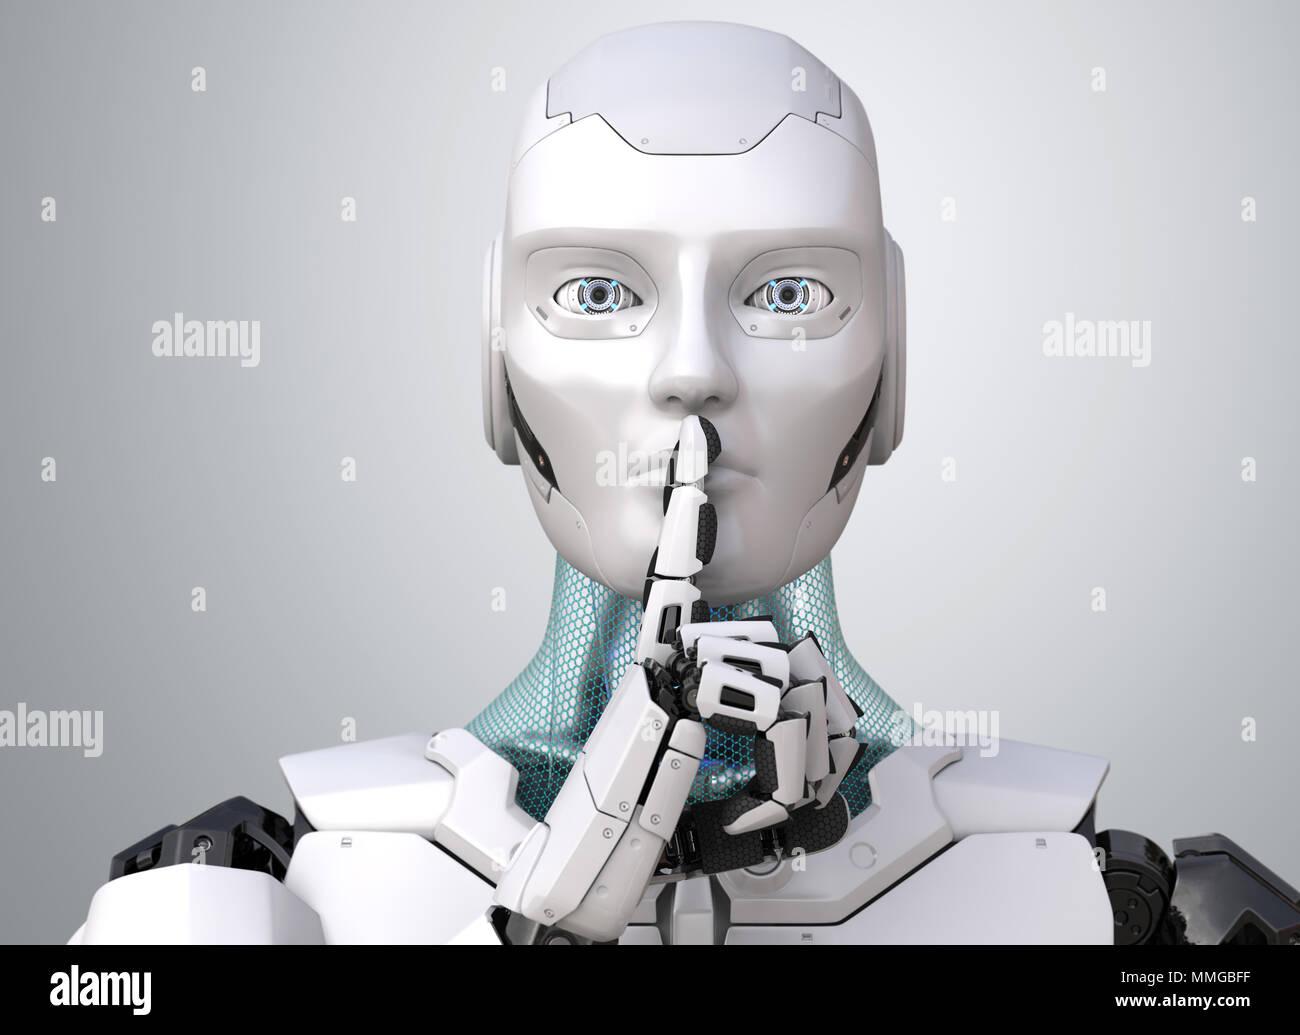 Robot with finger on lips asking for silence. 3D illustration - Stock Image